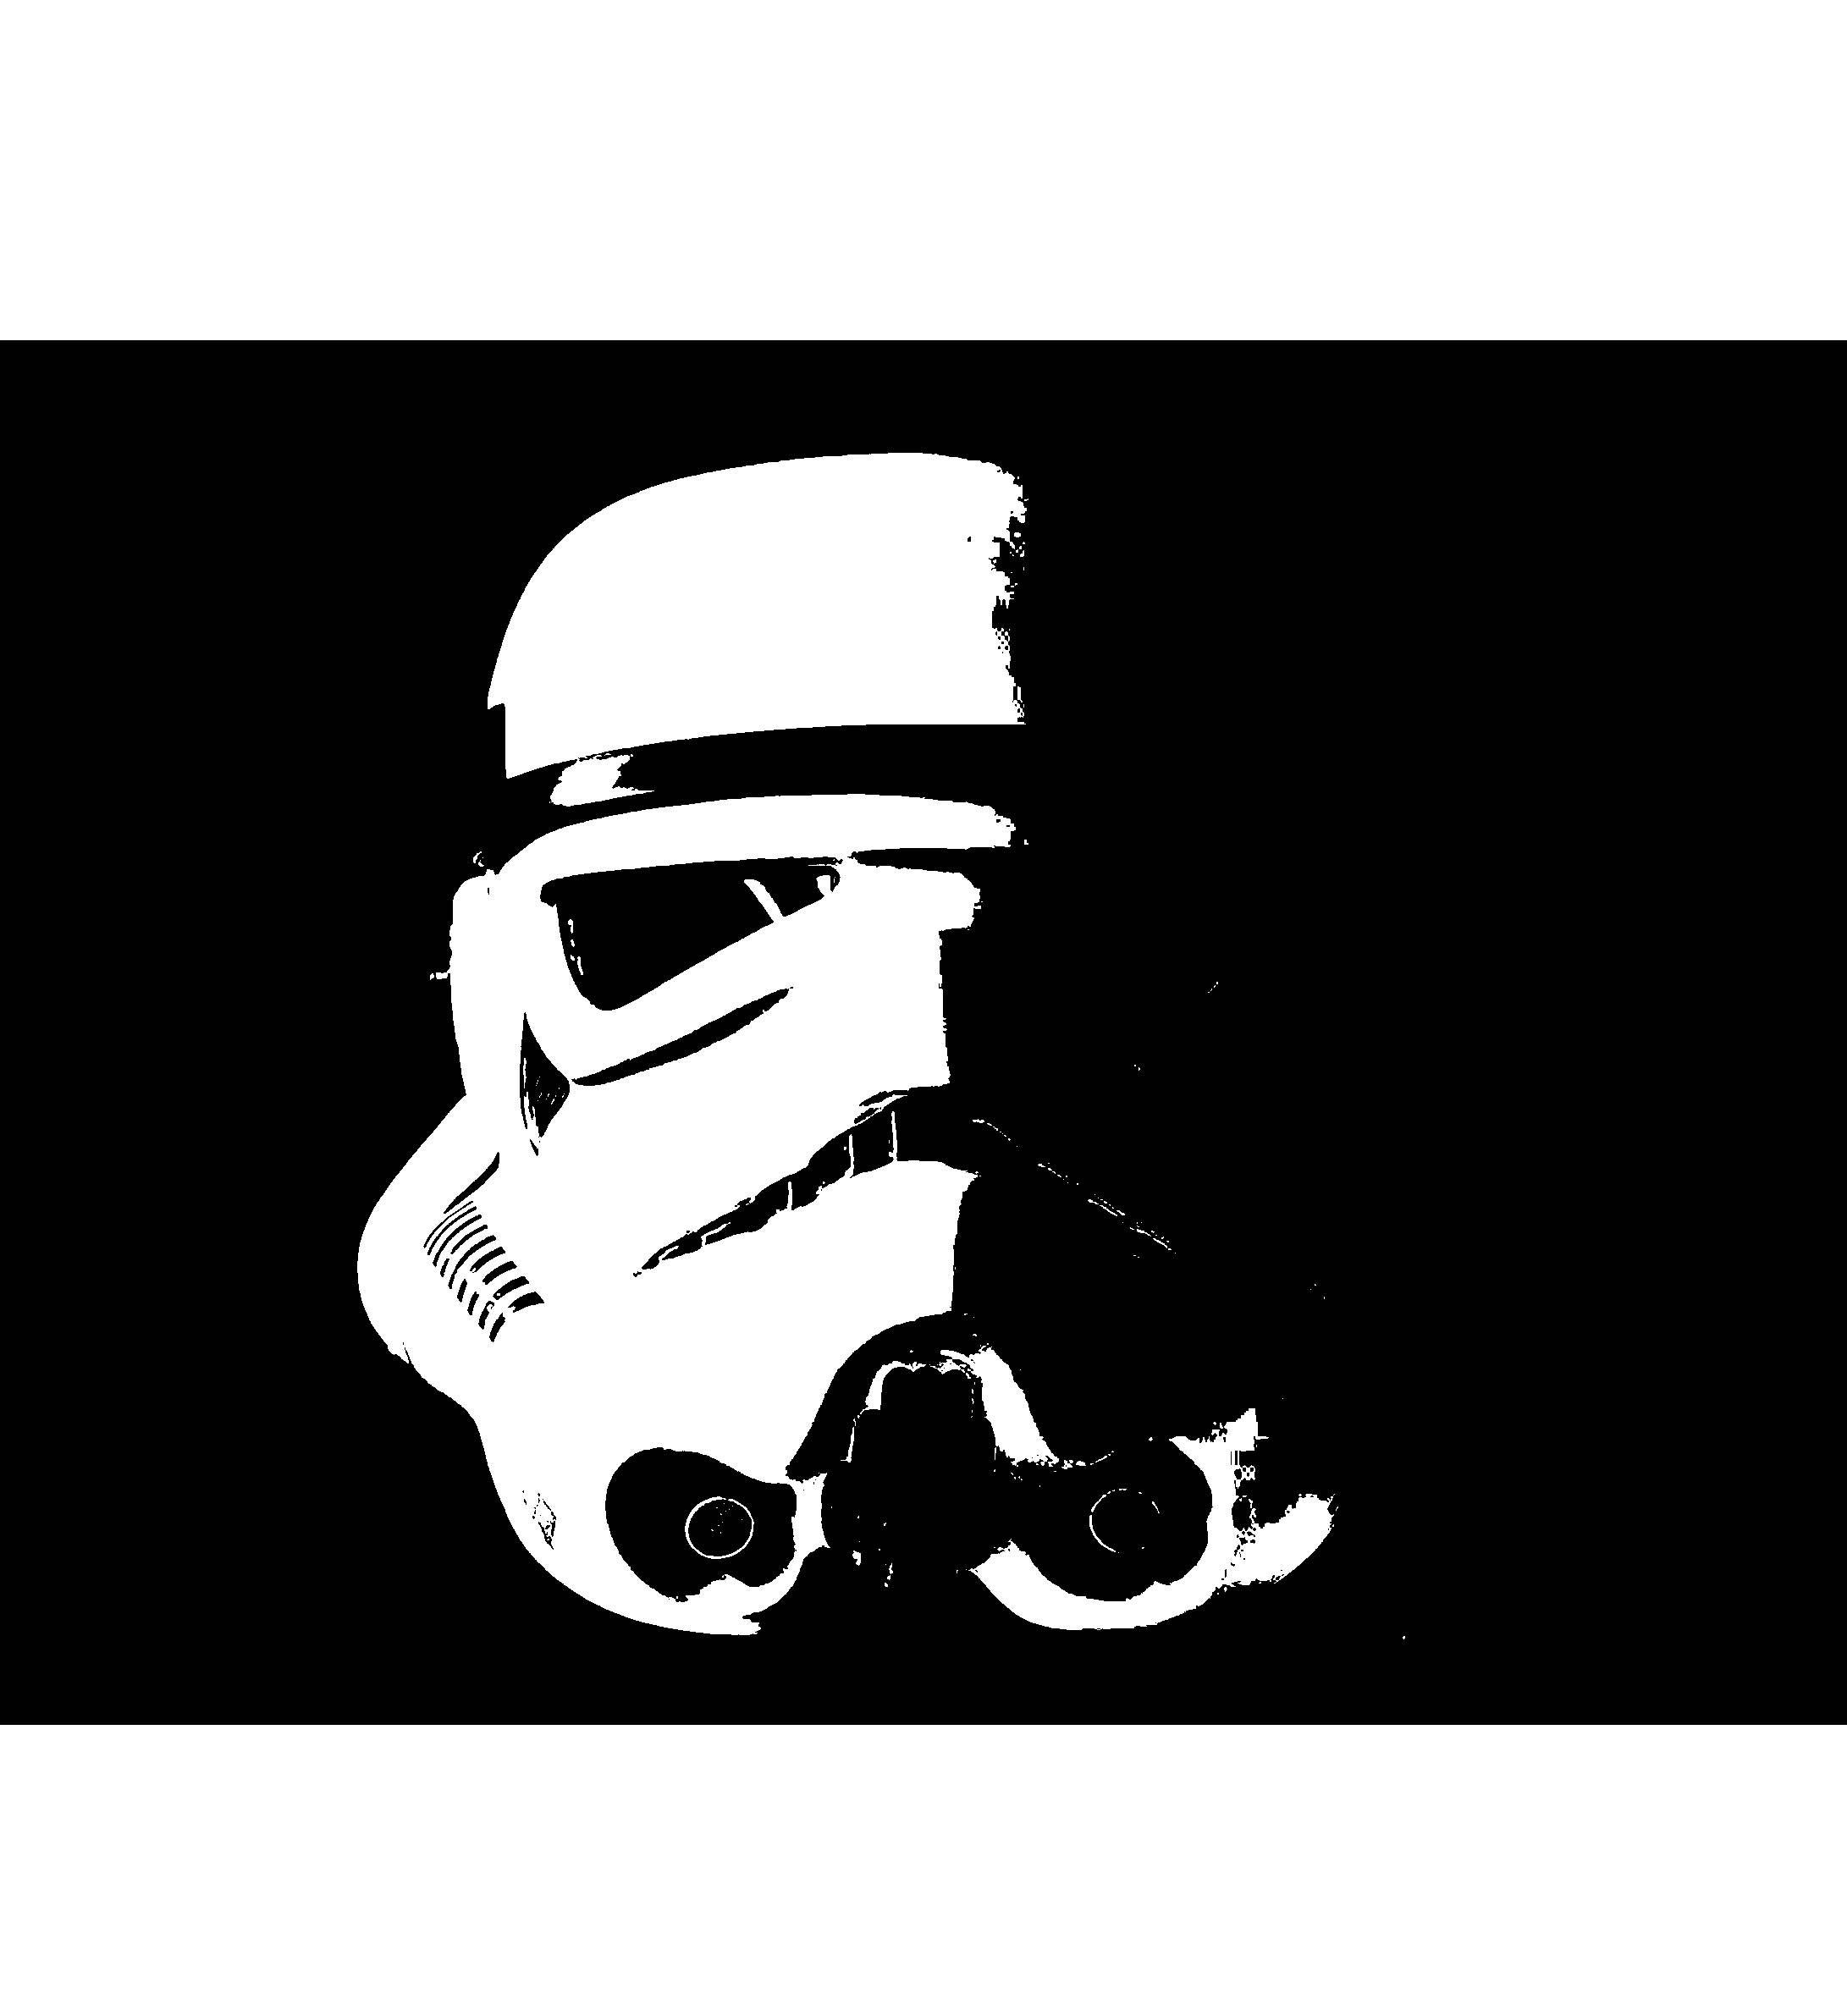 stormtrooper helmet vector stormtrooper h want to draw pinterest rh pinterest co uk stormtrooper vector helmet stormtrooper vector art